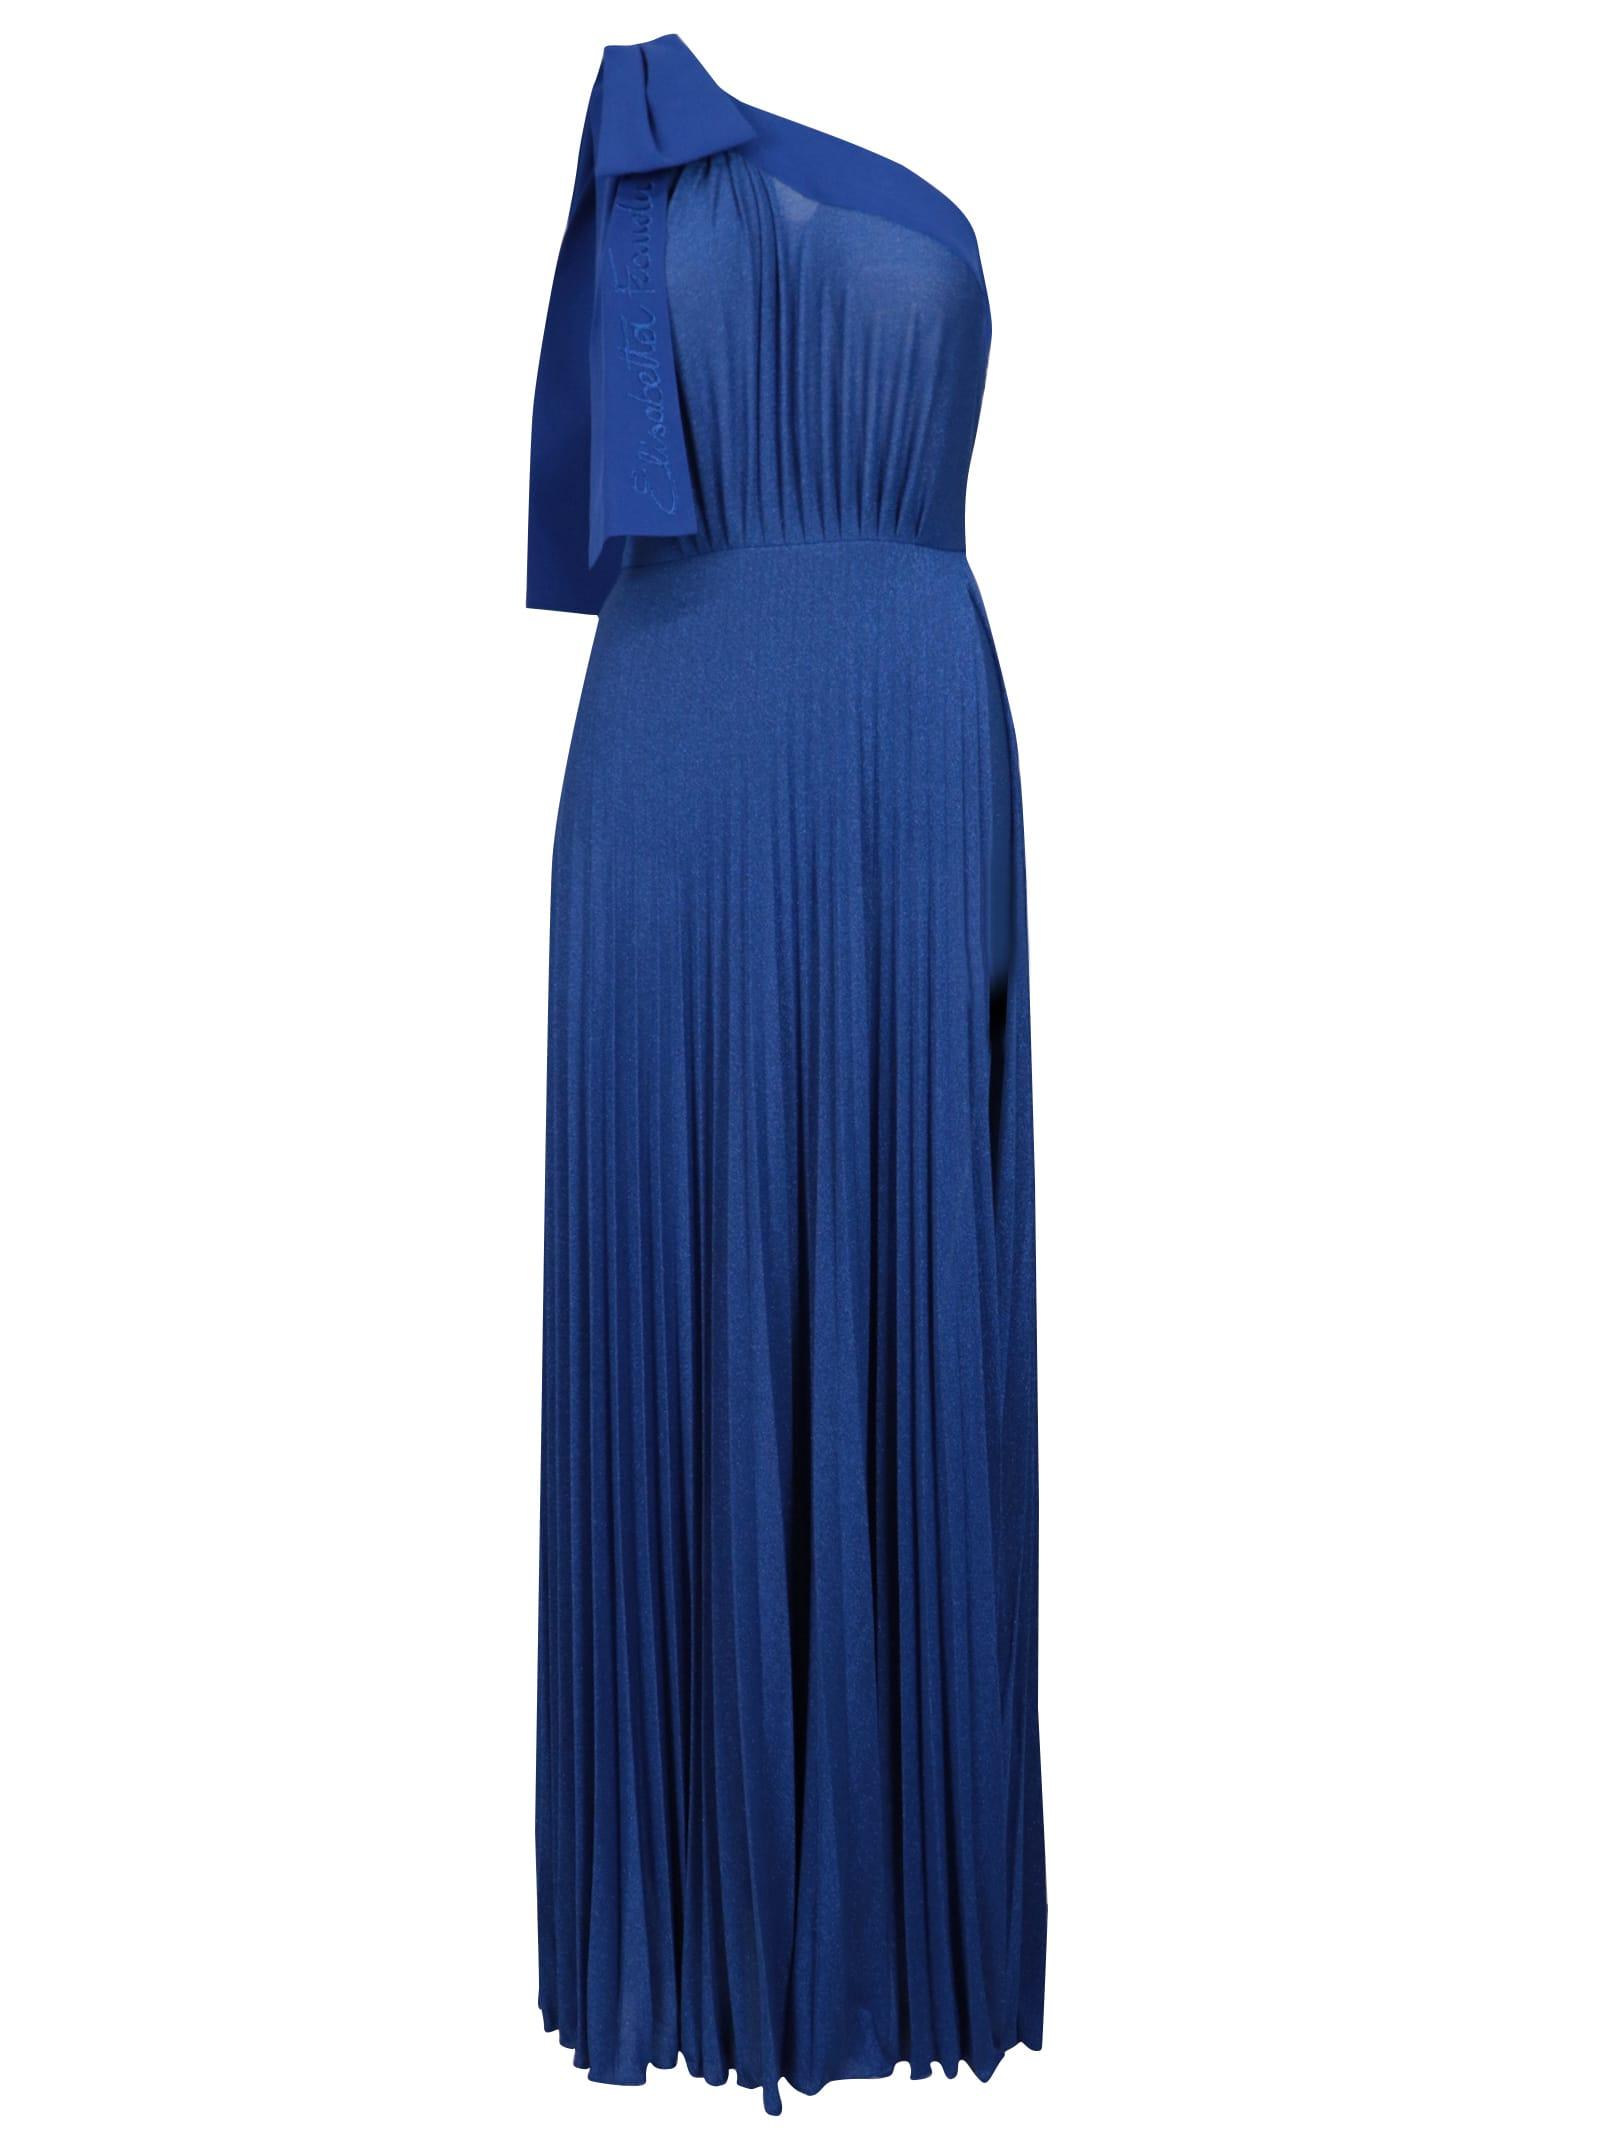 Buy Elisabetta Franchi Celyn B. Long Jersey Dress online, shop Elisabetta Franchi Celyn B. with free shipping